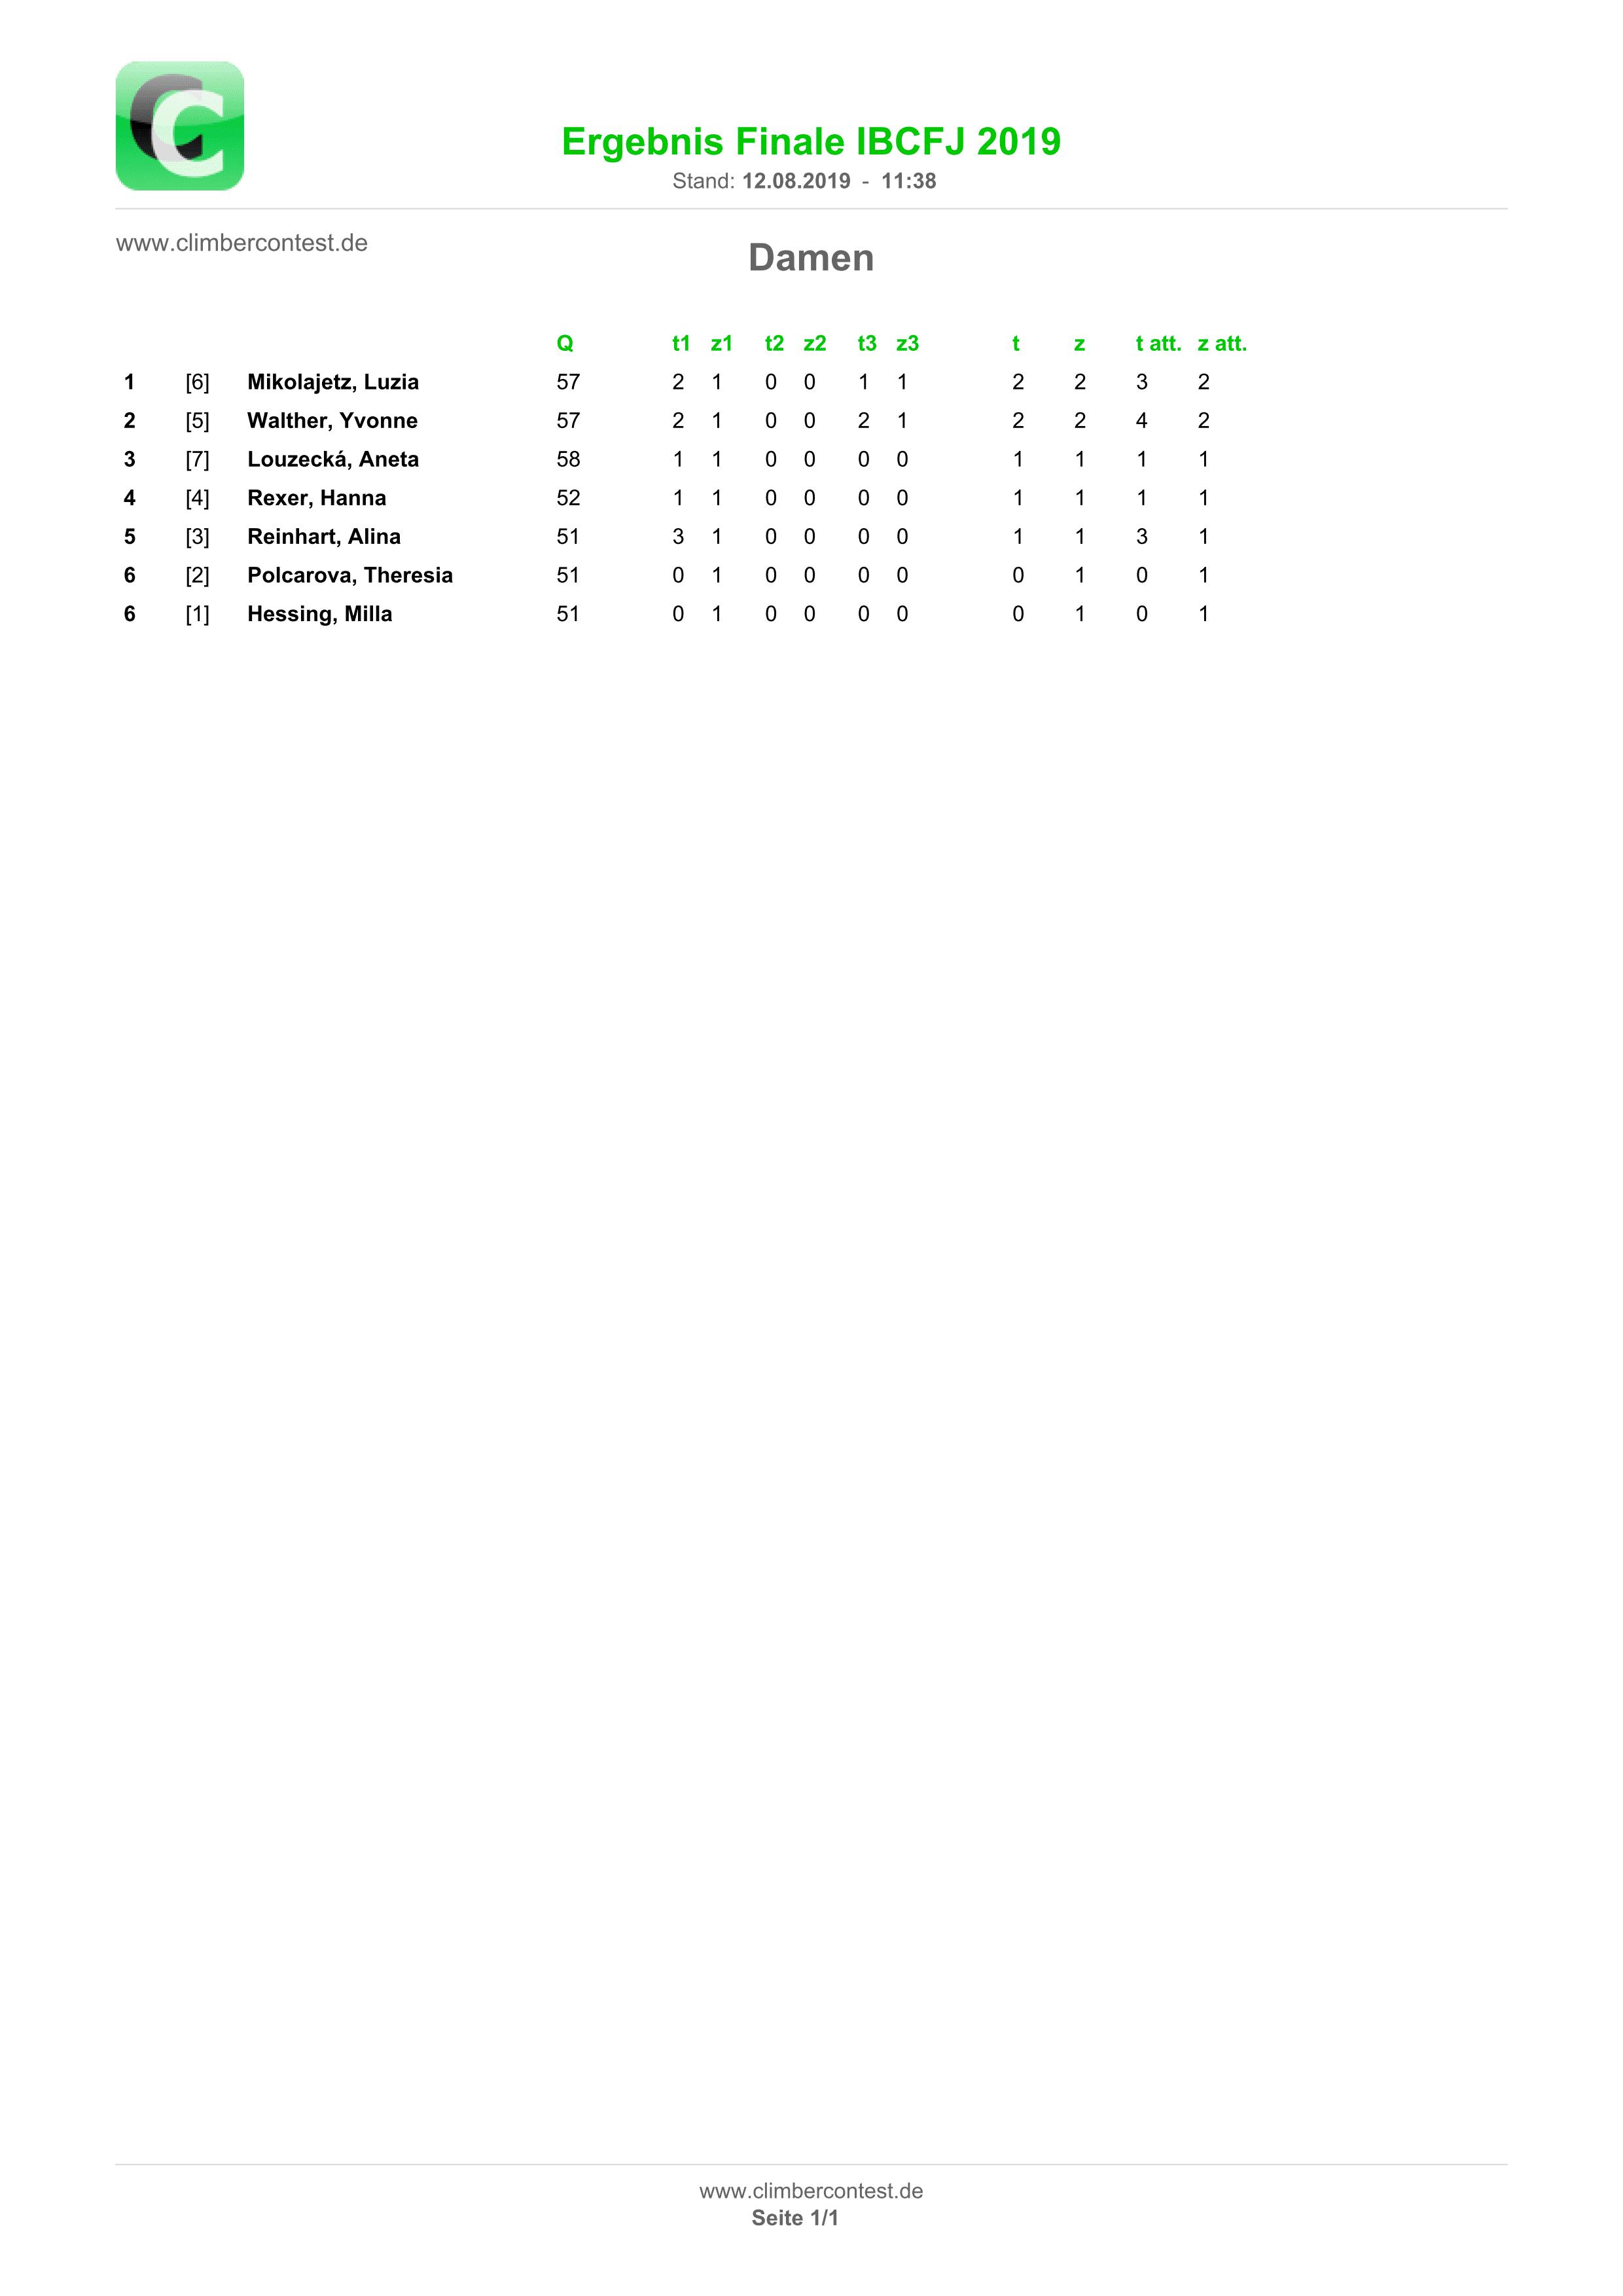 Ergebnisliste Finale Damen